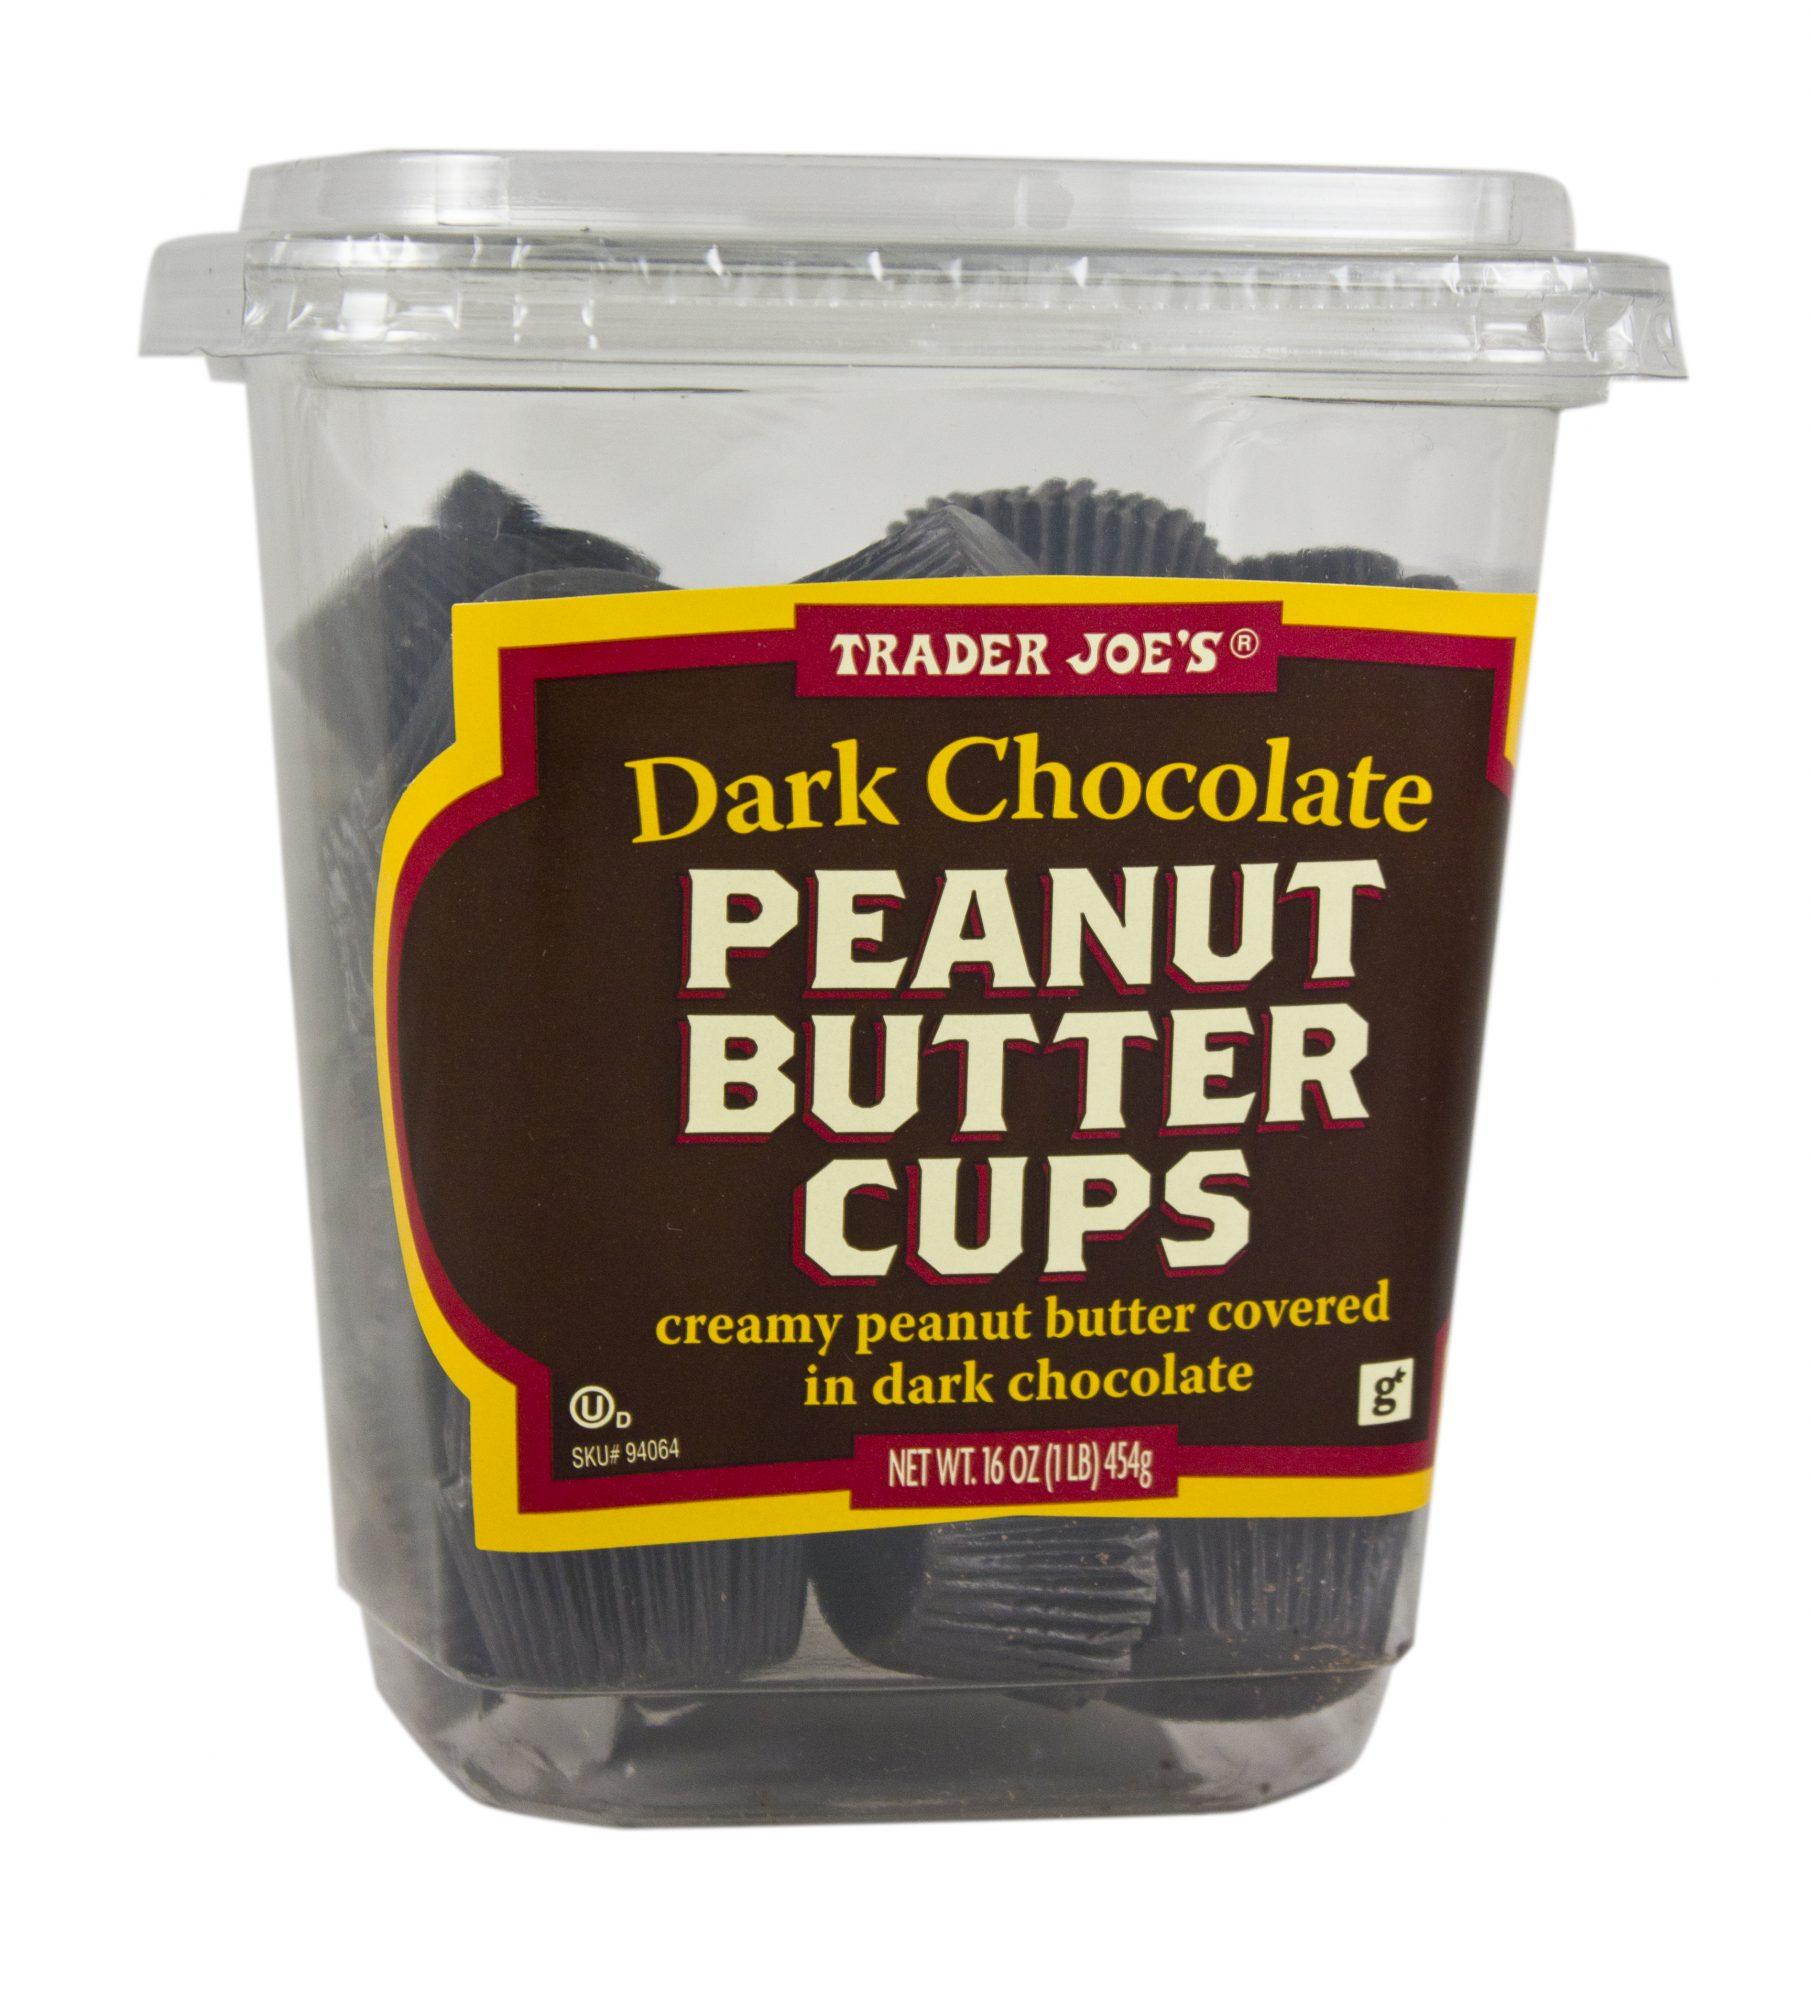 Dark-Chocolate-Peanut-Butter-Cups